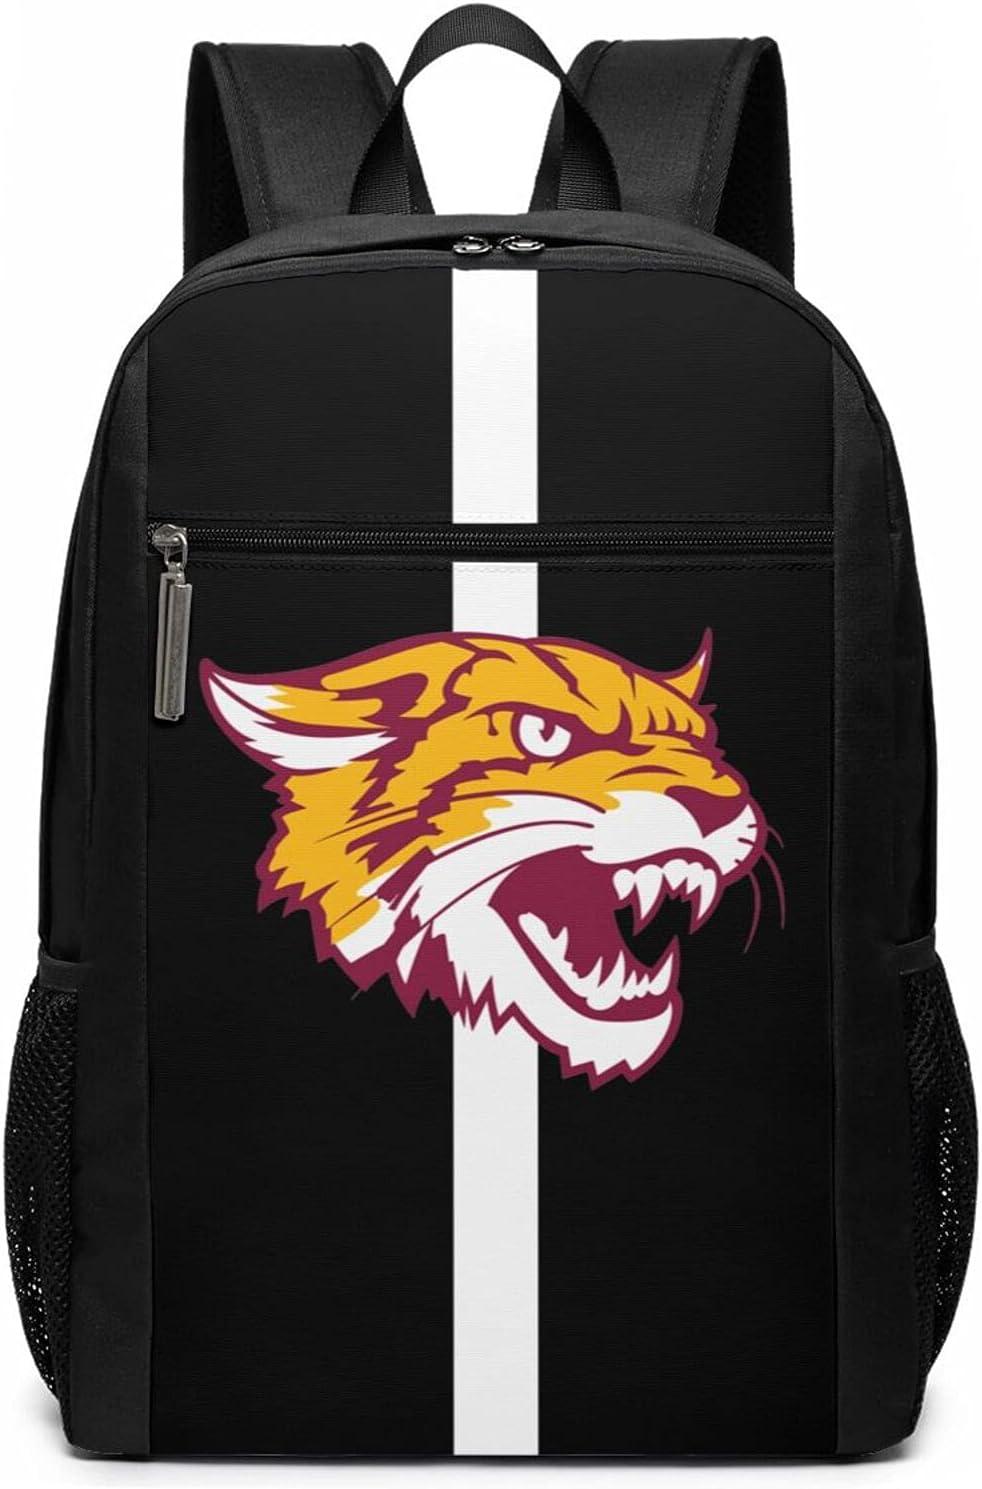 Bethune-Cookman A Popular popular University Logo Backpack Gift Print Spasm price Unisex Tra